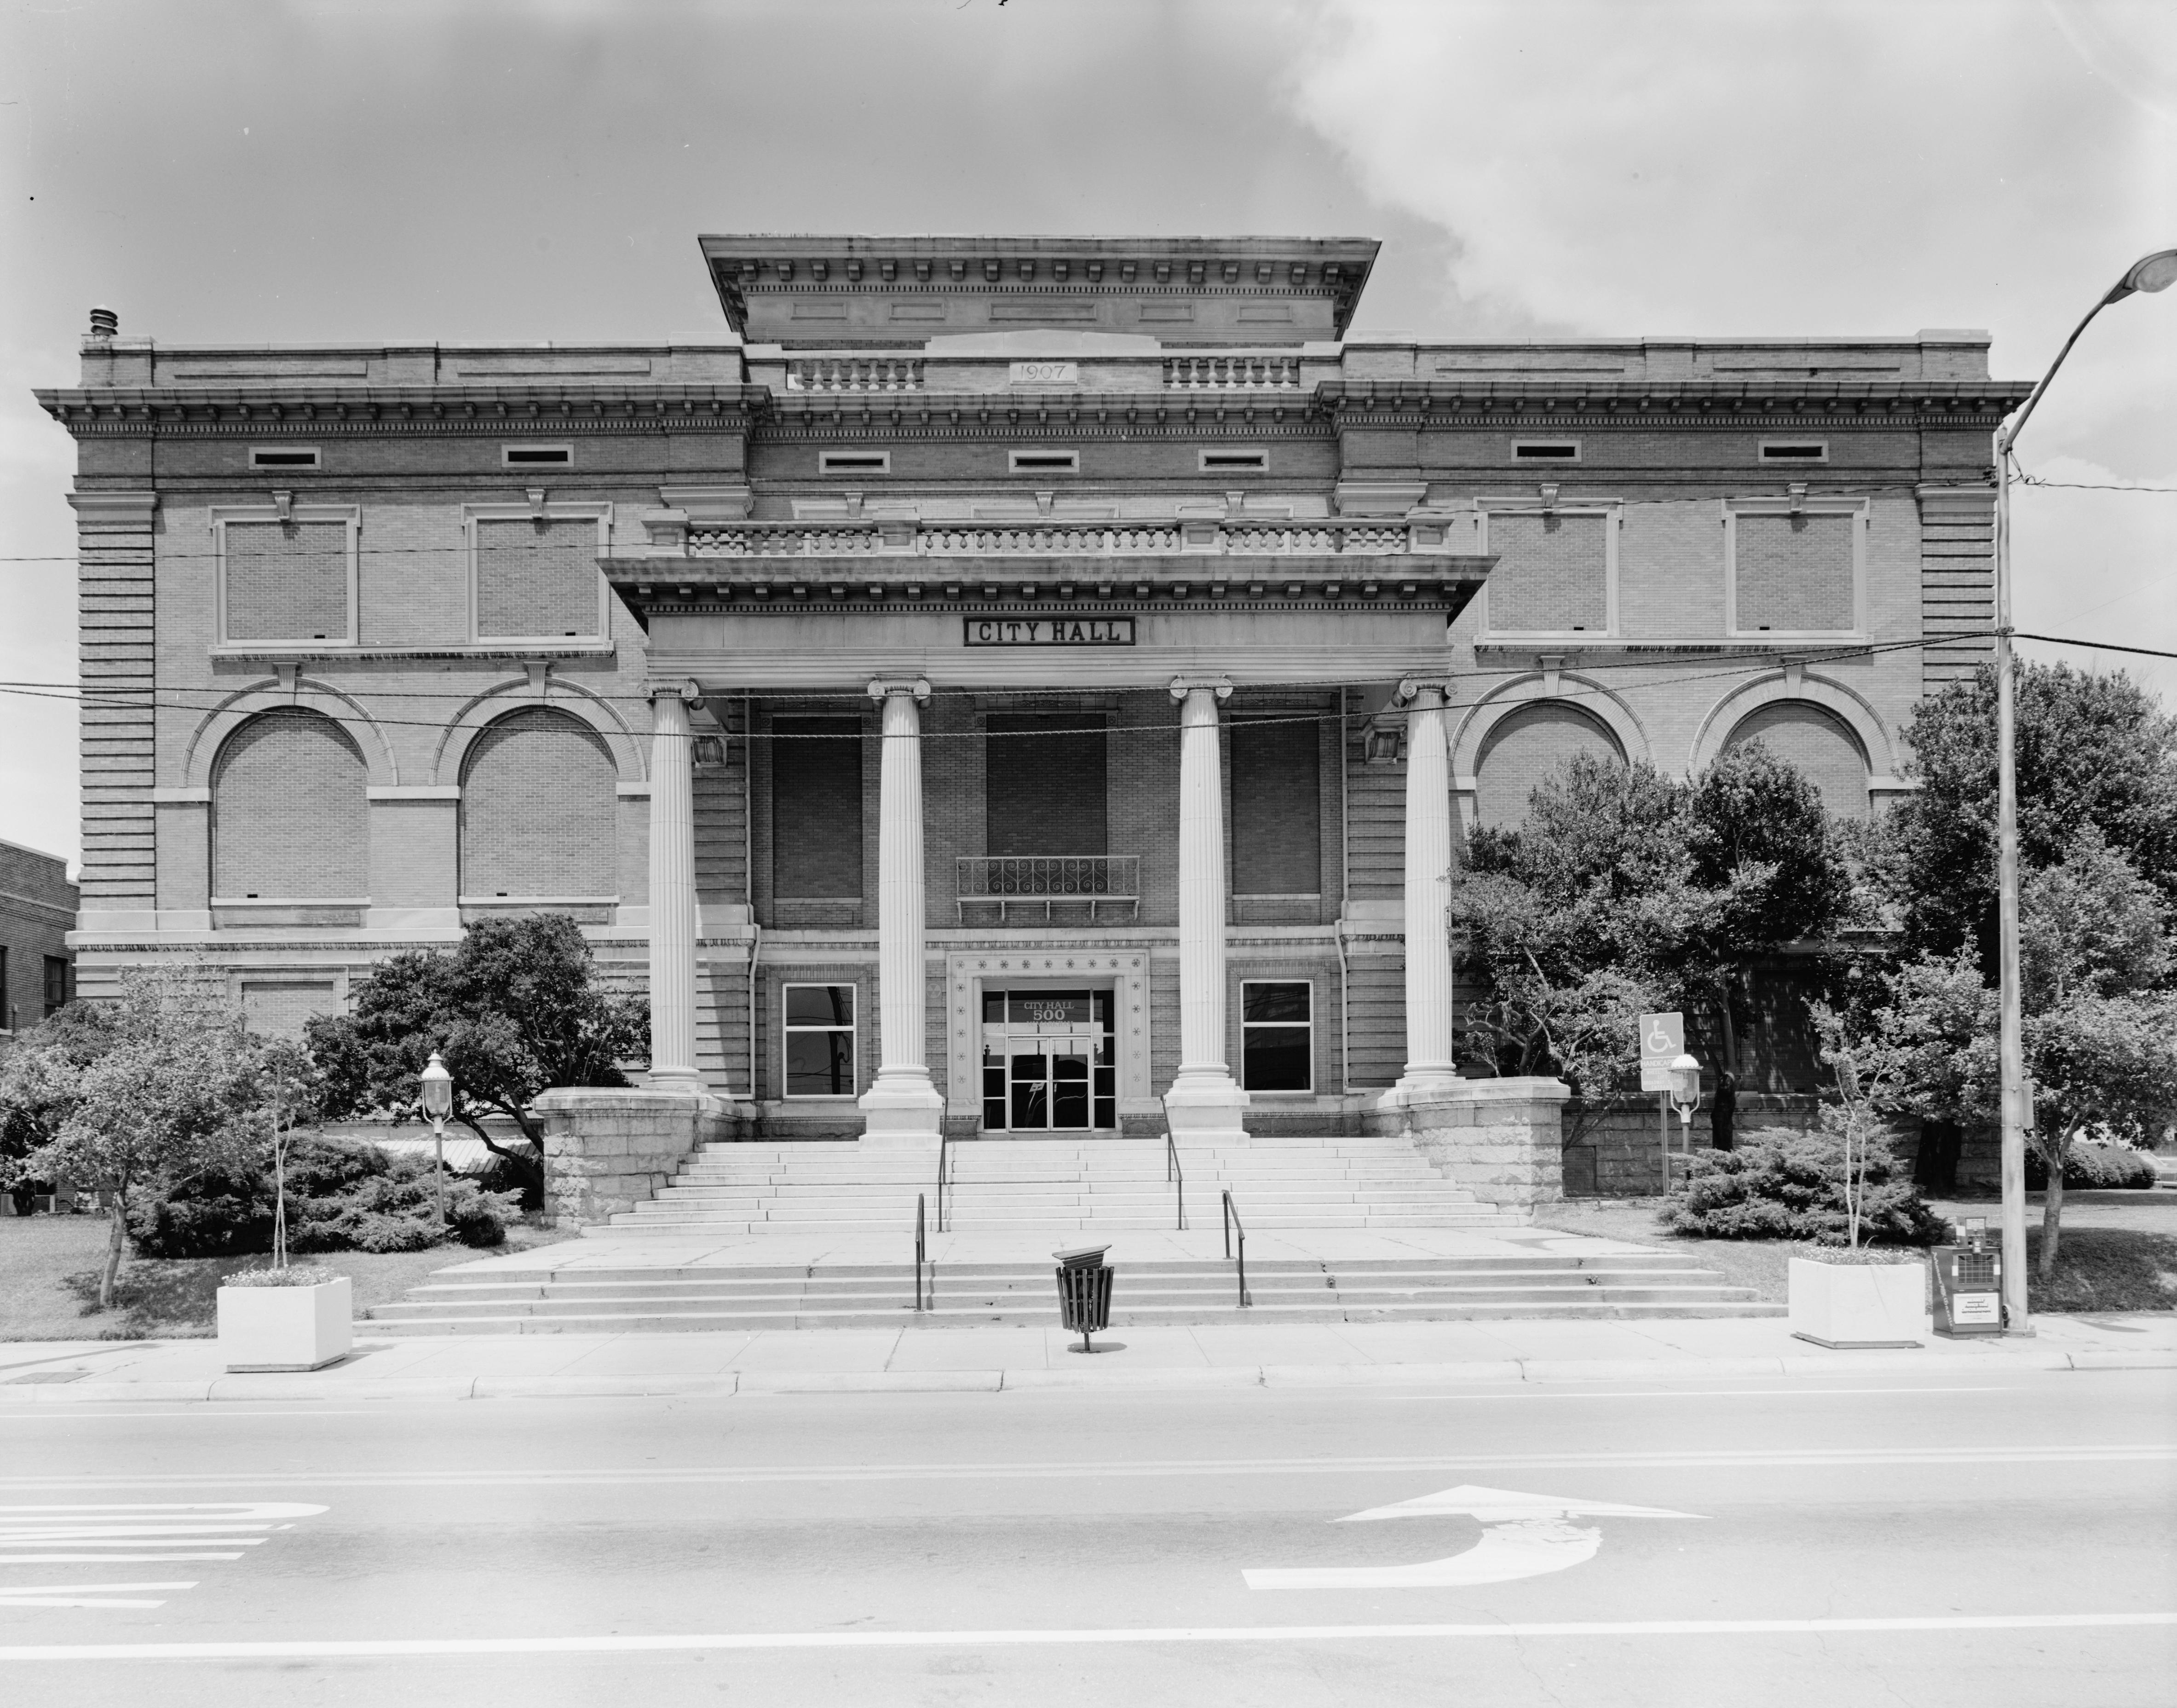 City Hall Of Forrest City Ar